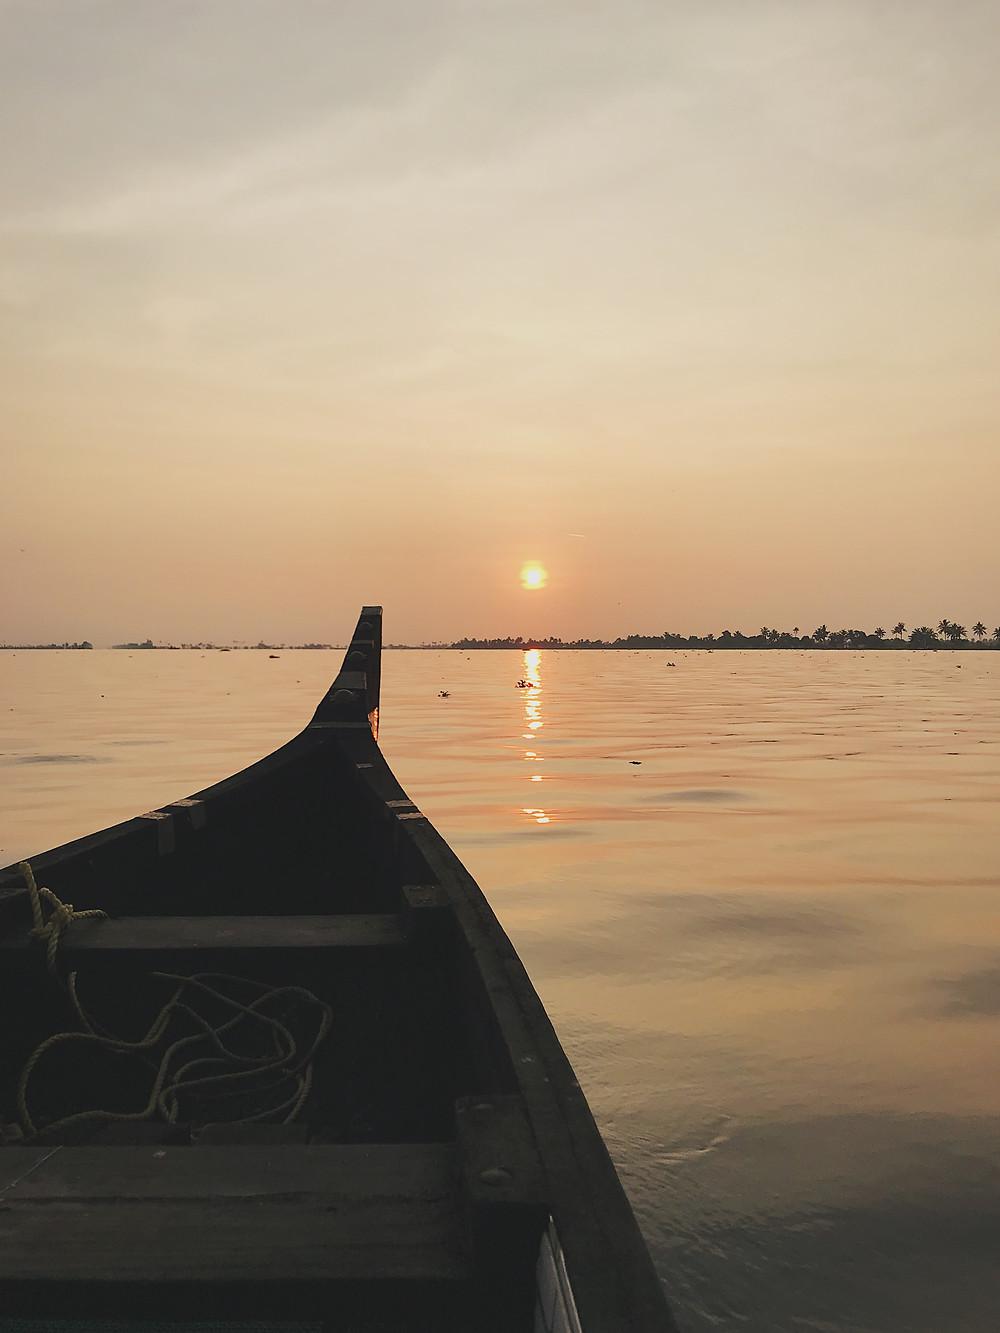 Vembanad Lake, Alappuzha, Kerala, India